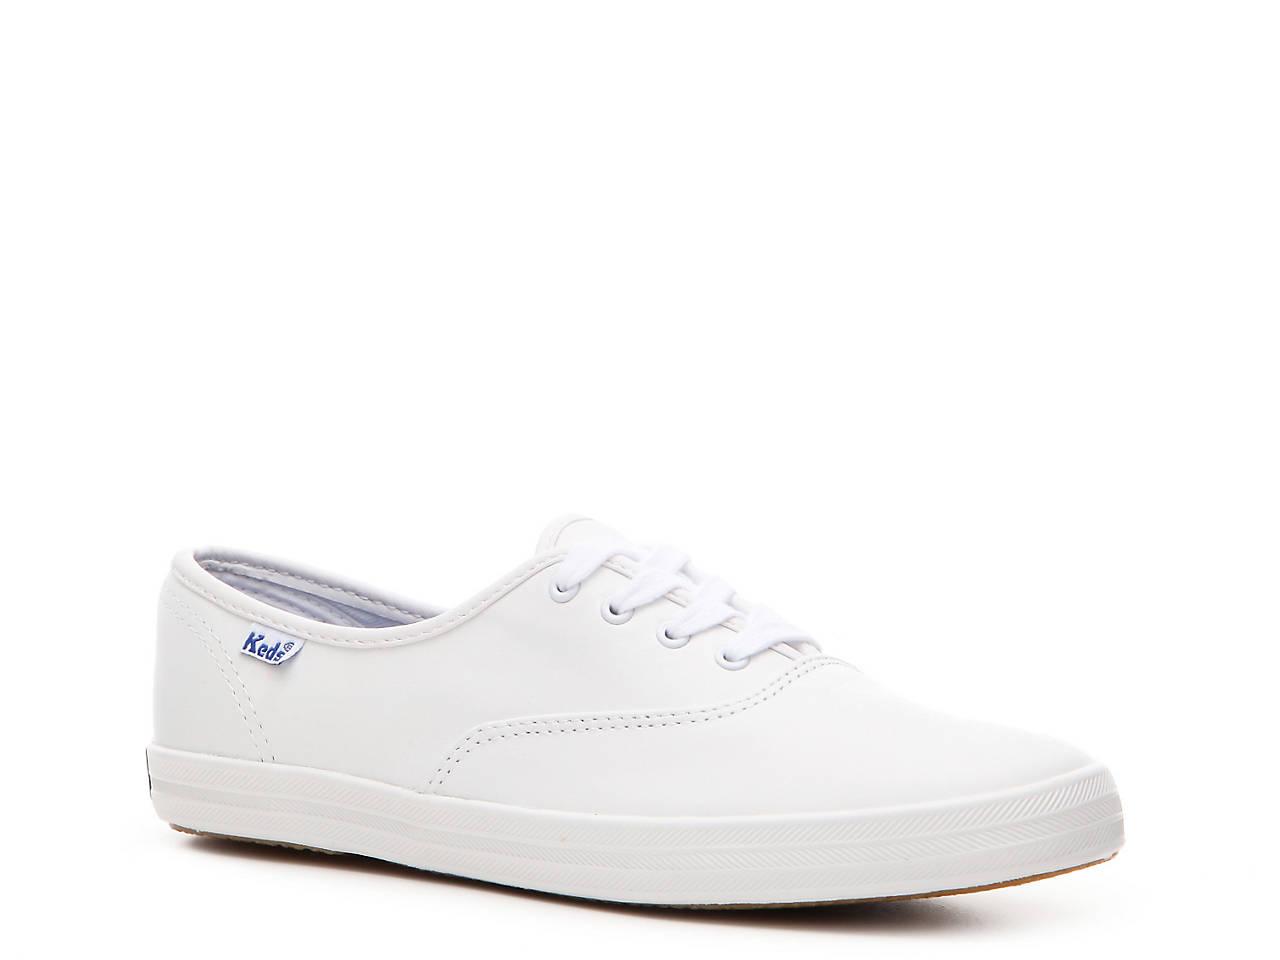 c60a60a70f2 Keds Champion Sneaker - Women s Women s Shoes